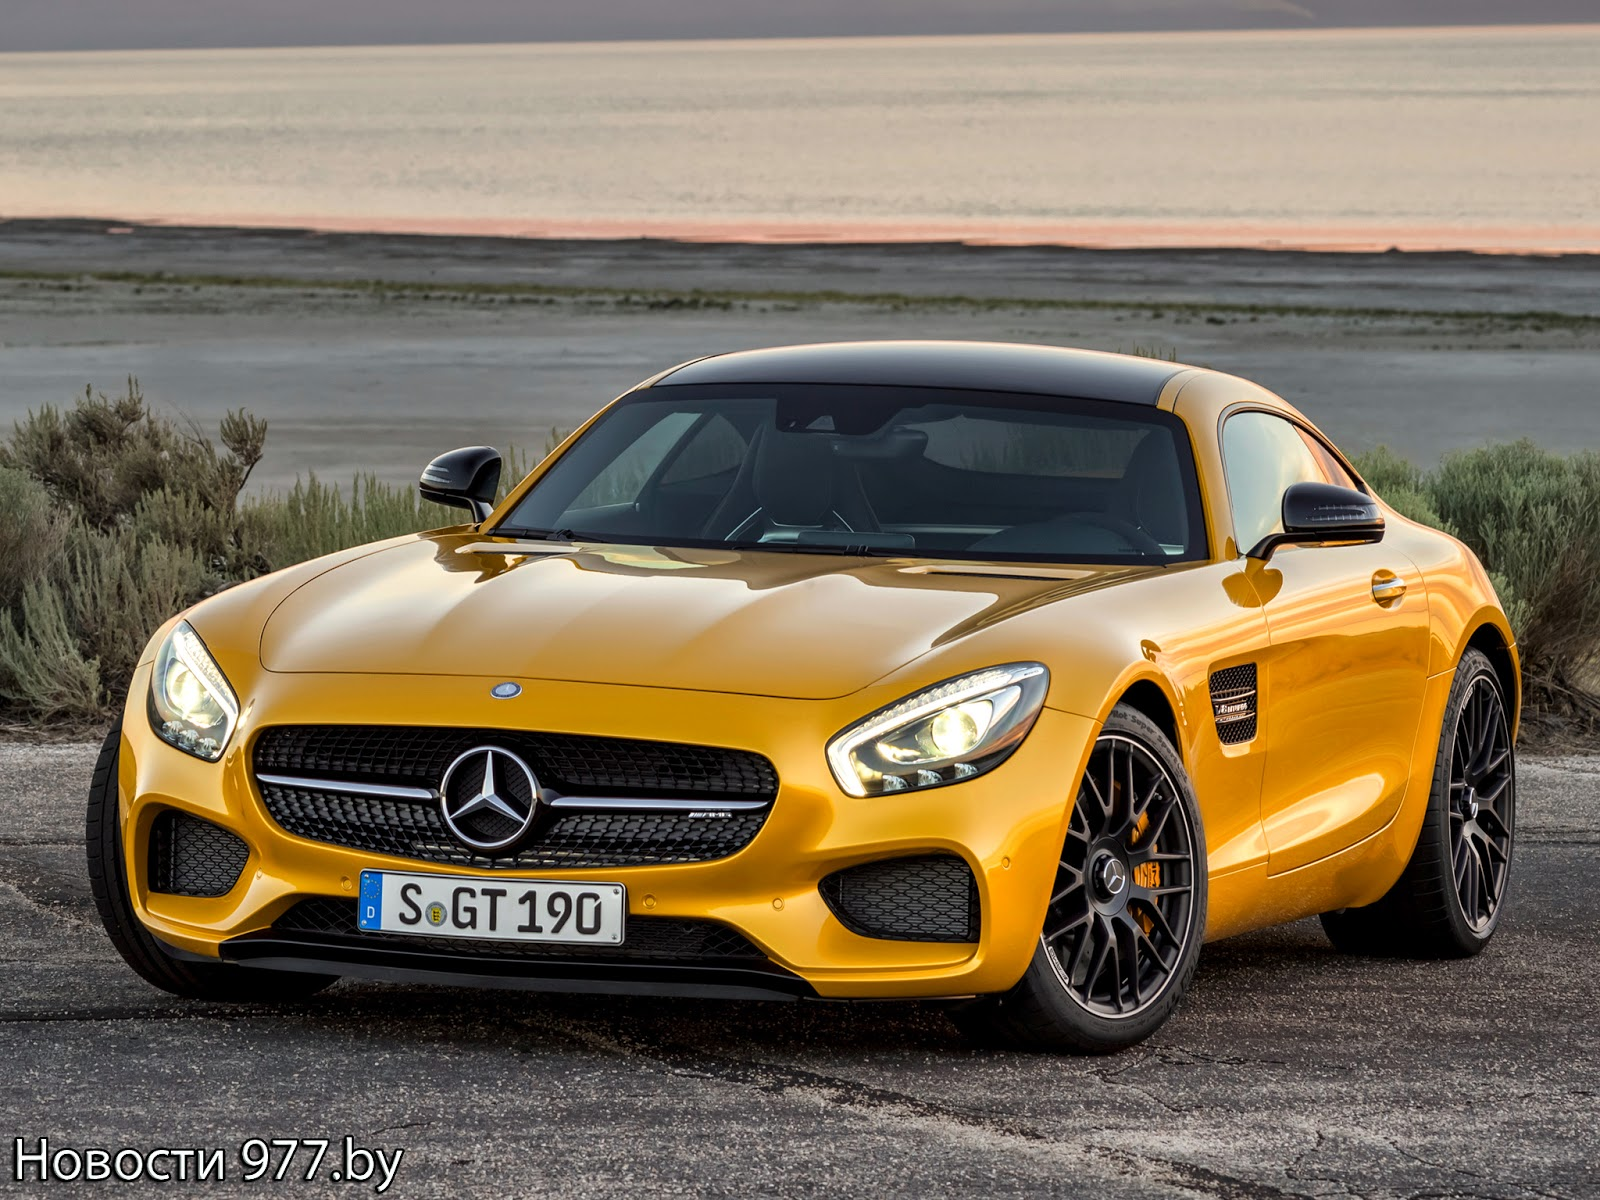 Mercedes-AMG GT новости 977.by